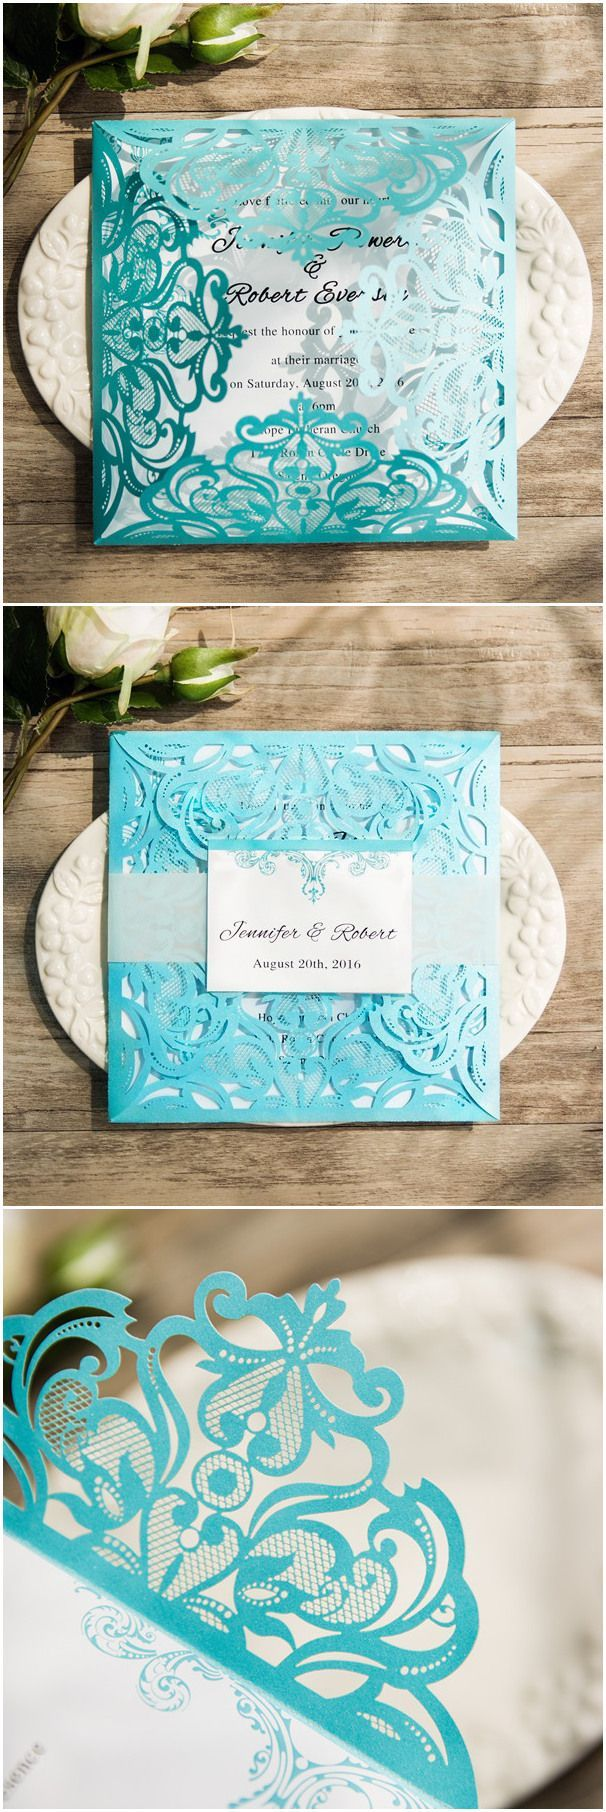 30 Best Laser Cut Wedding Invitations Images On Pinterest Laser